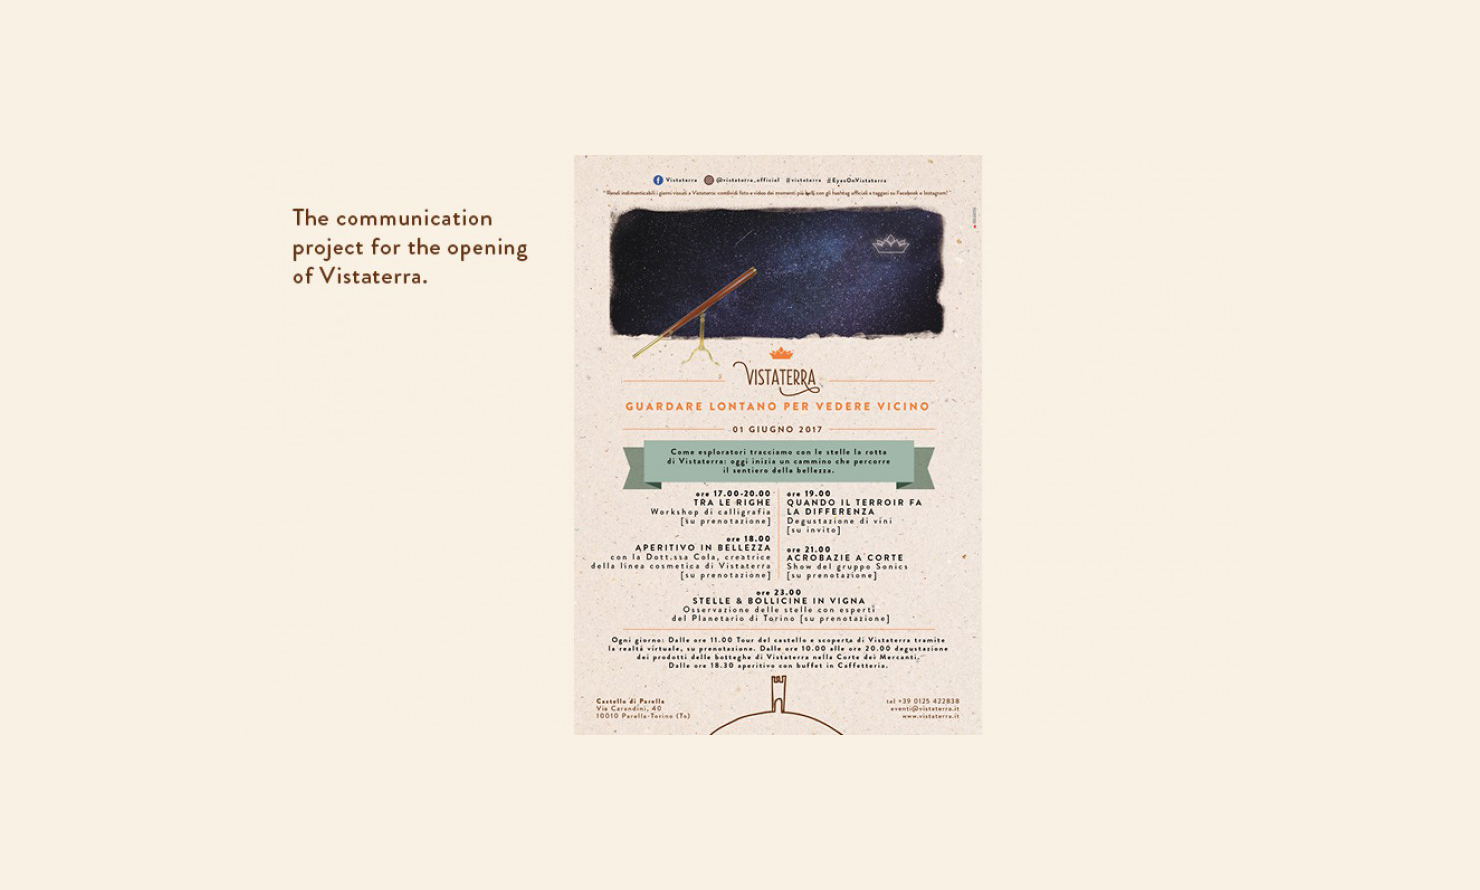 https://kubelibre.com/uploads/Slider-work-tutti-clienti/manital-vistaterra-comunicazione-integrata-2.jpg